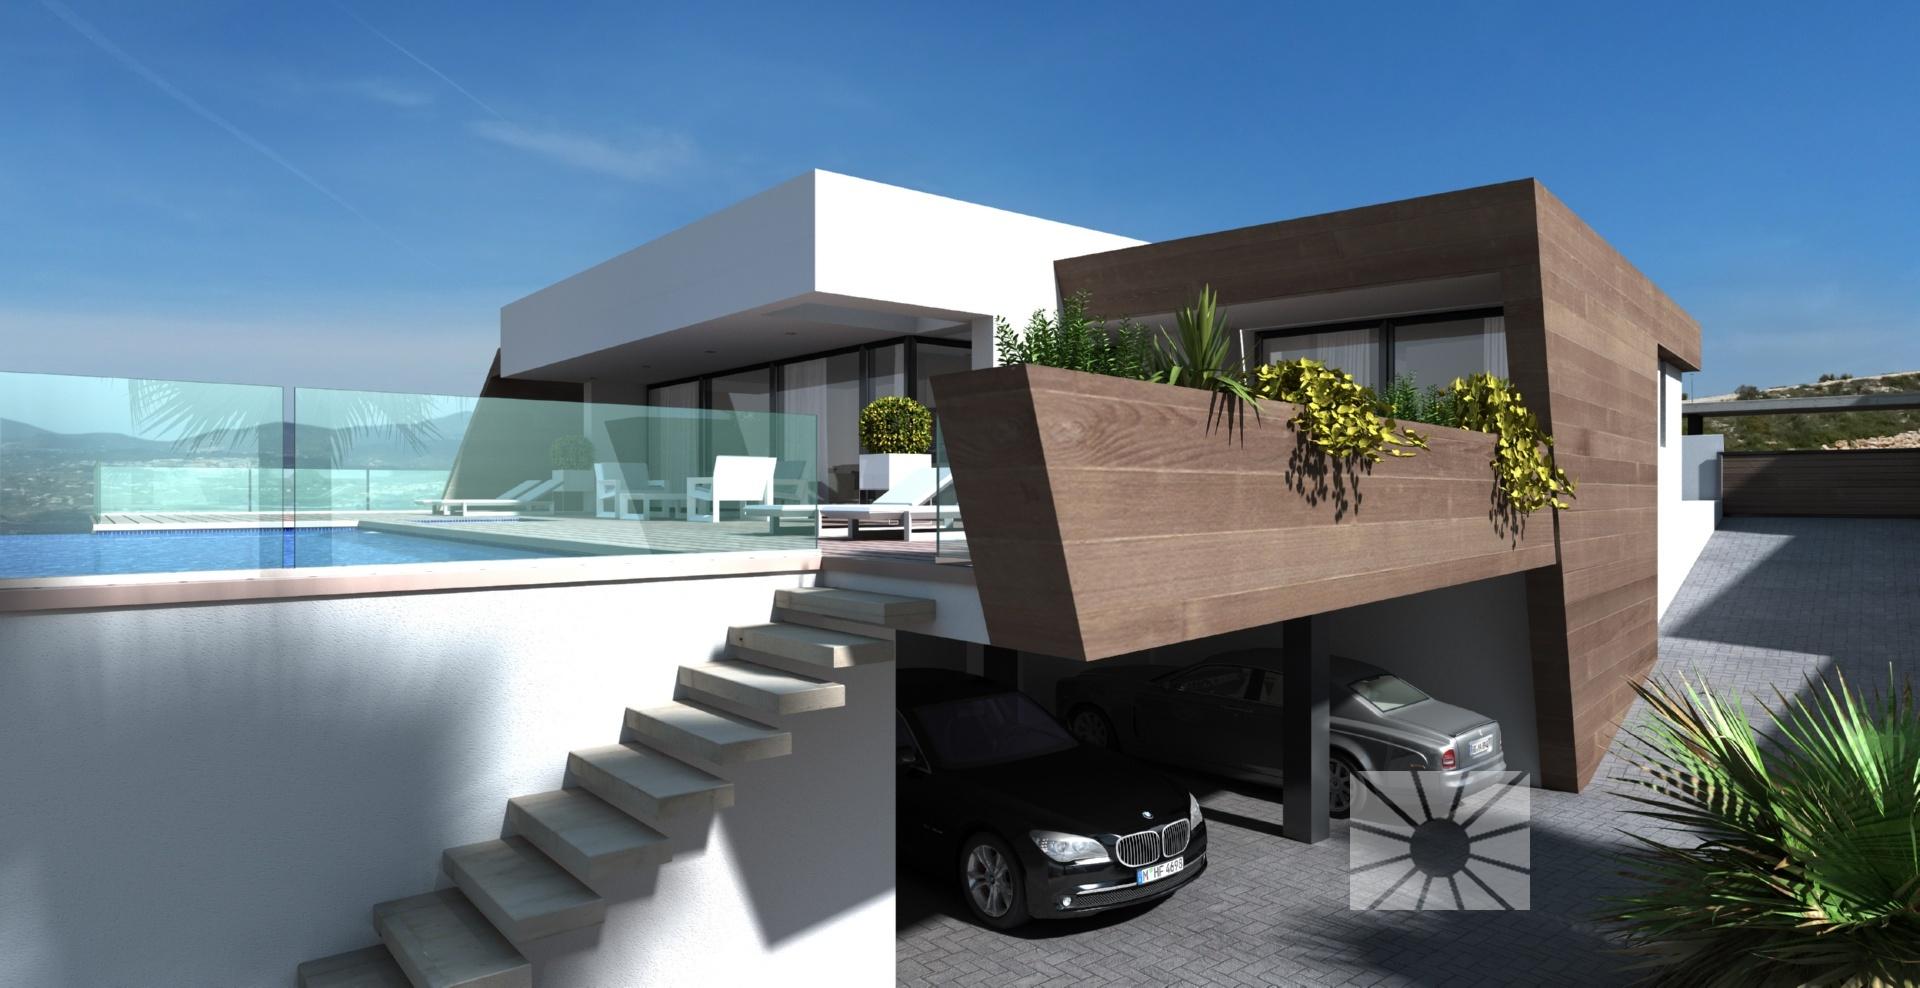 Villa bellavista chalet de lujo moderno en venta en for Planos de chalets modernos